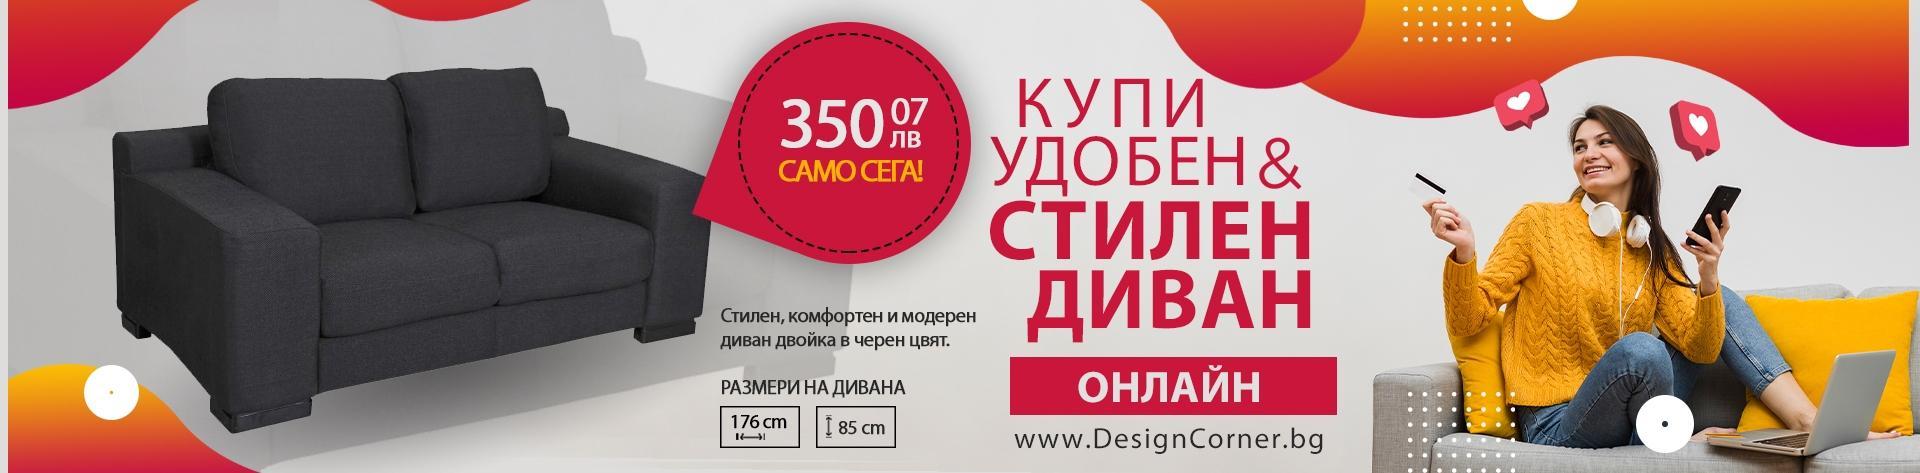 Промоция на дивани в DesignCorner